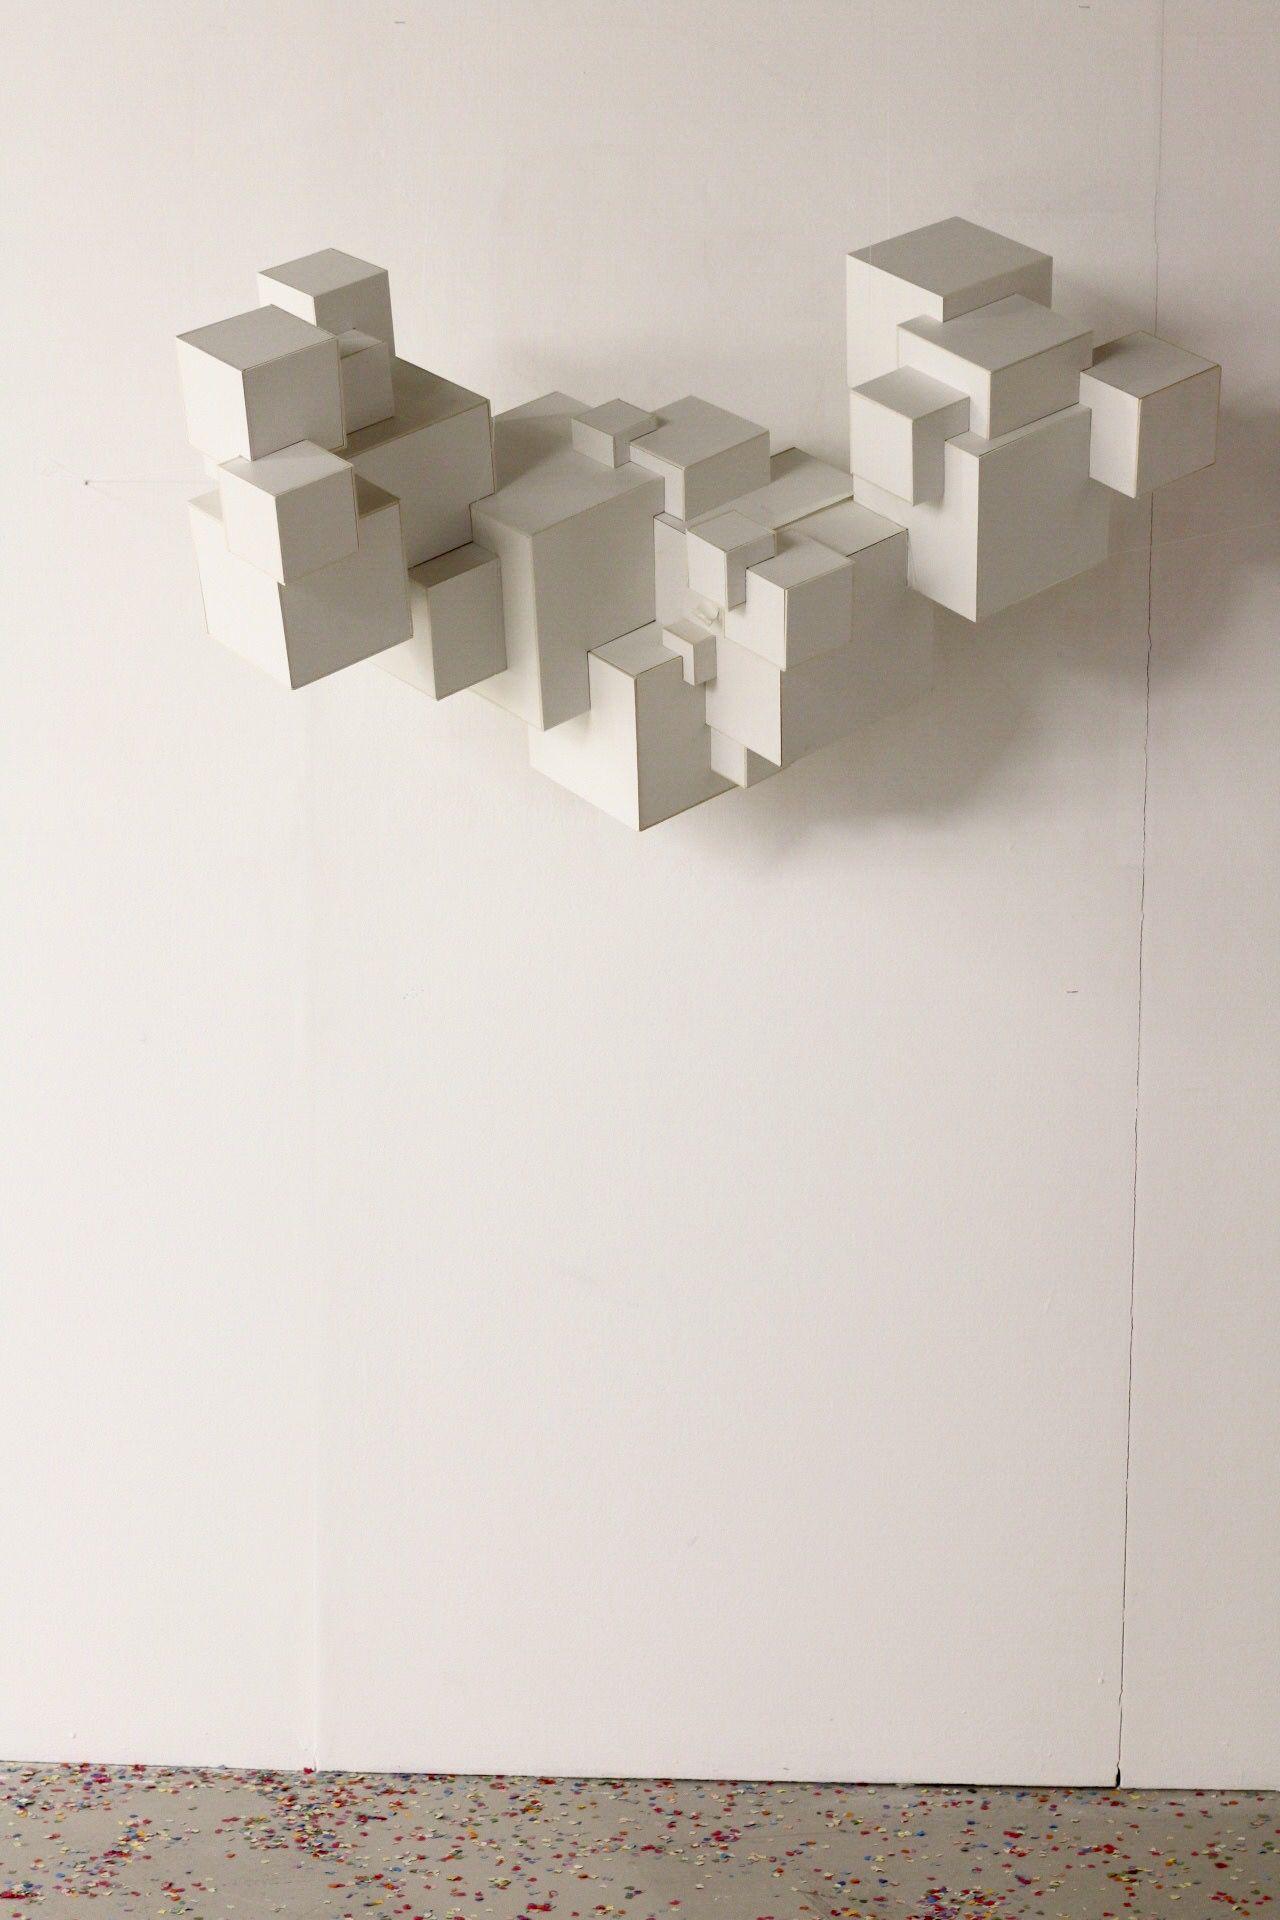 Sculpture by WILLPOWER STUDIOS